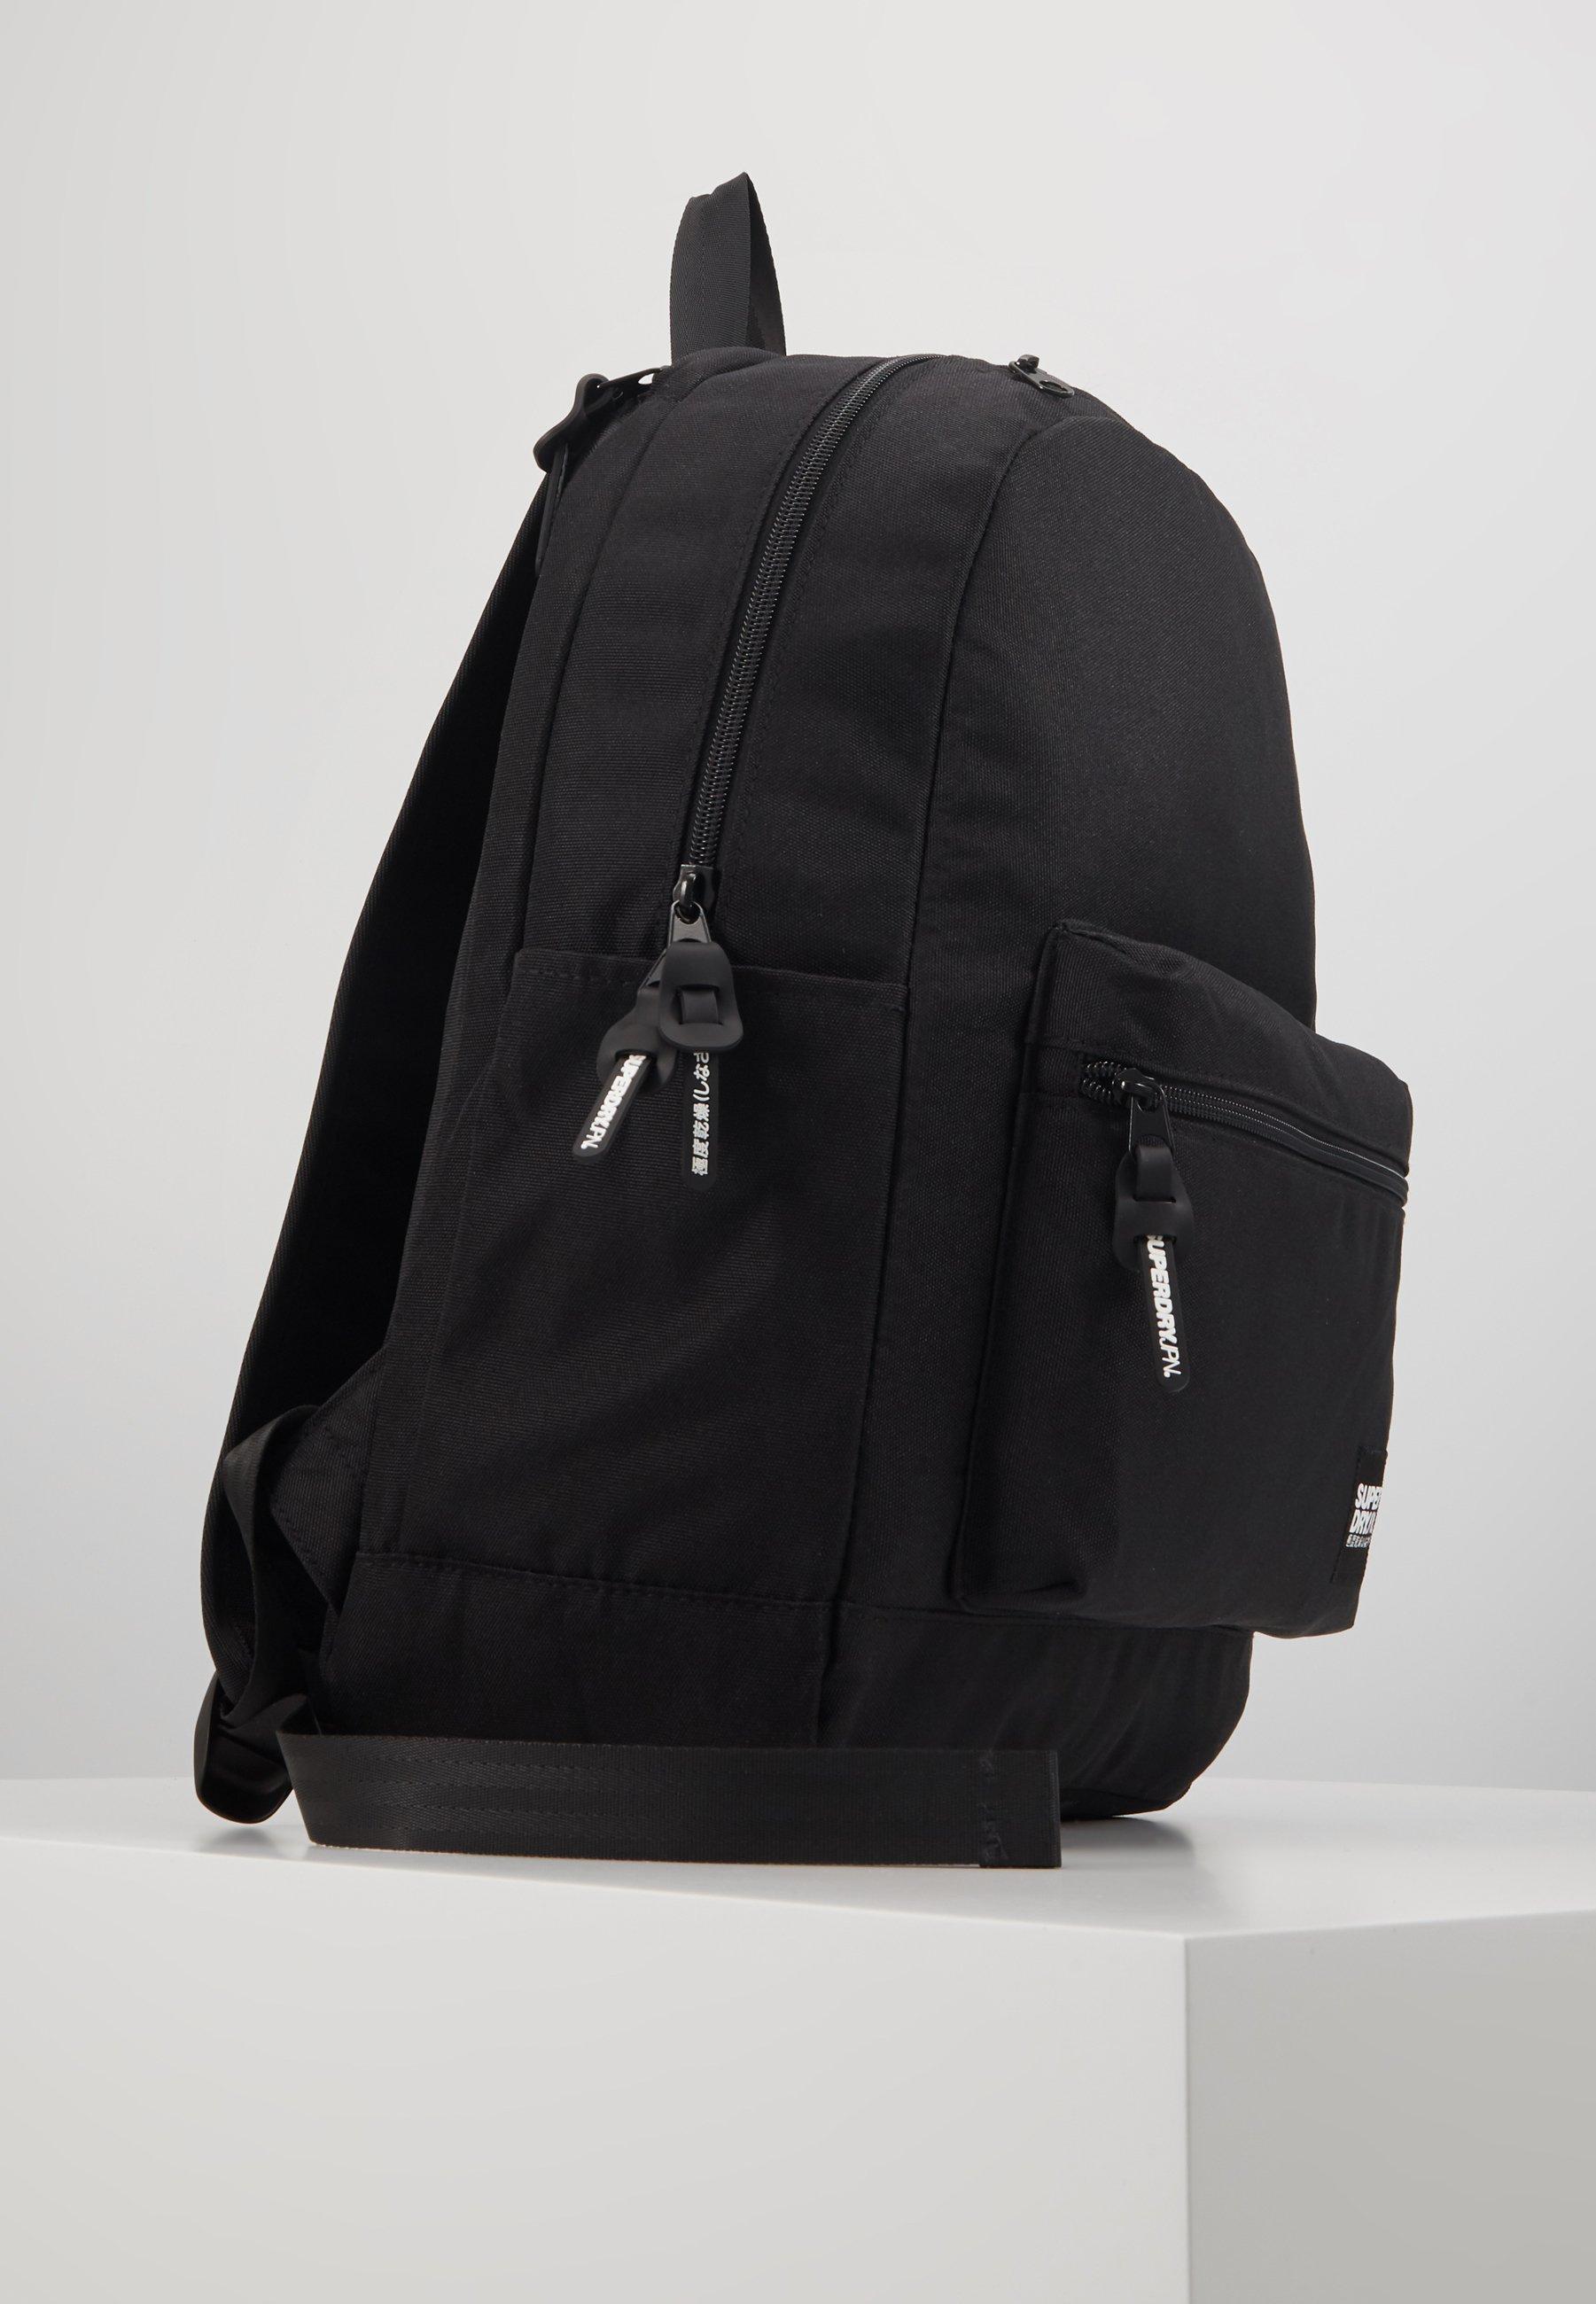 Superdry CITY PACK - Ryggsekk - black/svart a4b1lH2l9o9ySpj